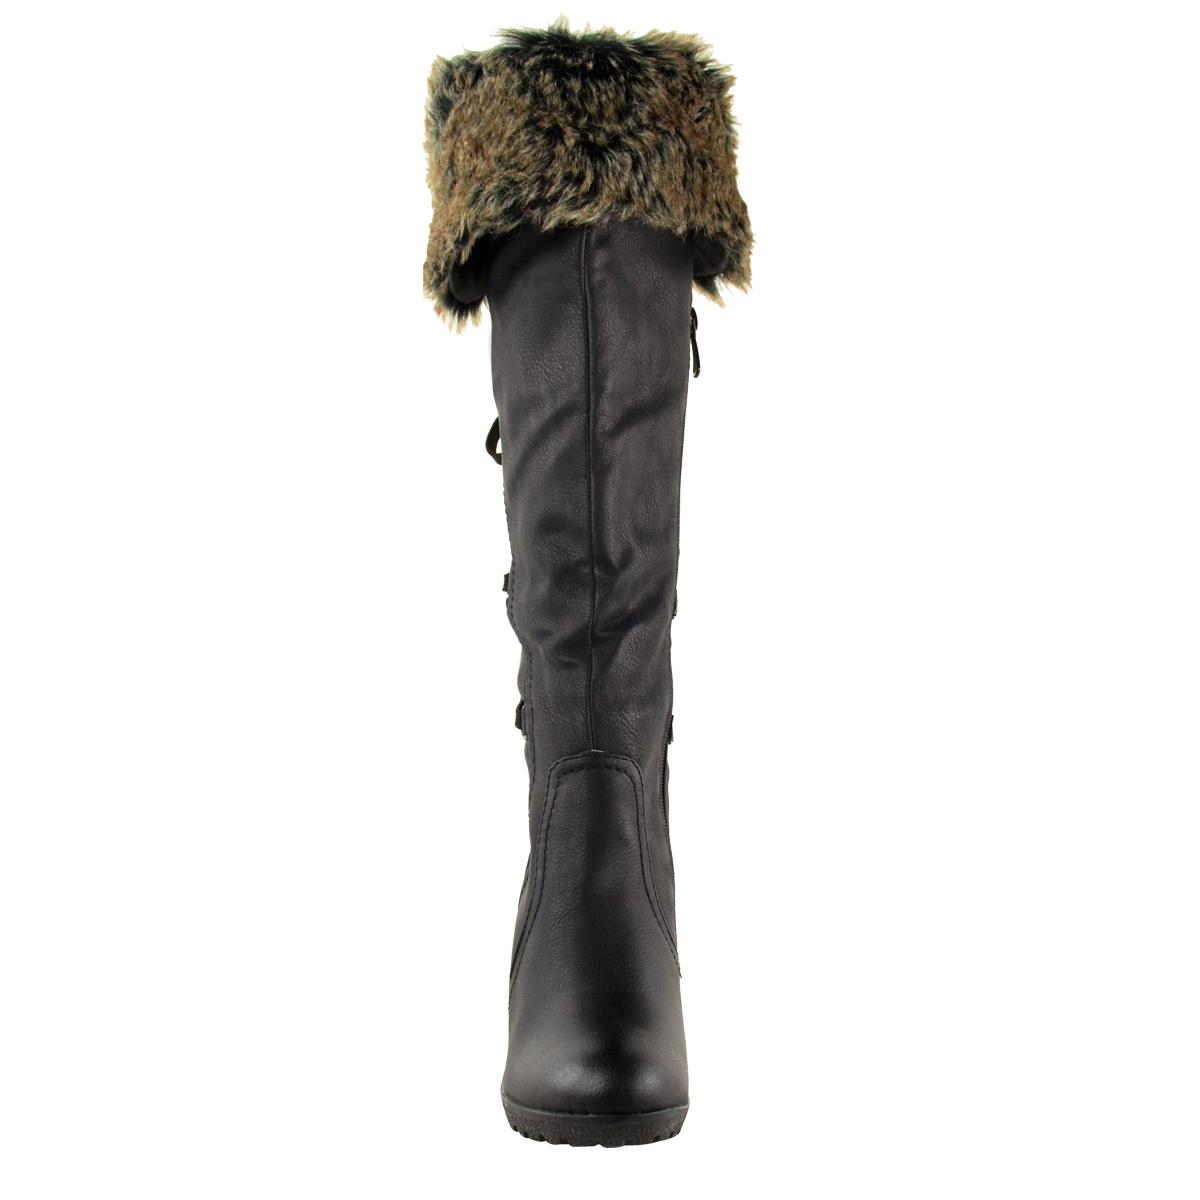 Womens-Ladies-Wedge-Low-Heel-Winter-Knee-Boots-Warm-Faux-Fur-Fleece-Size-UK